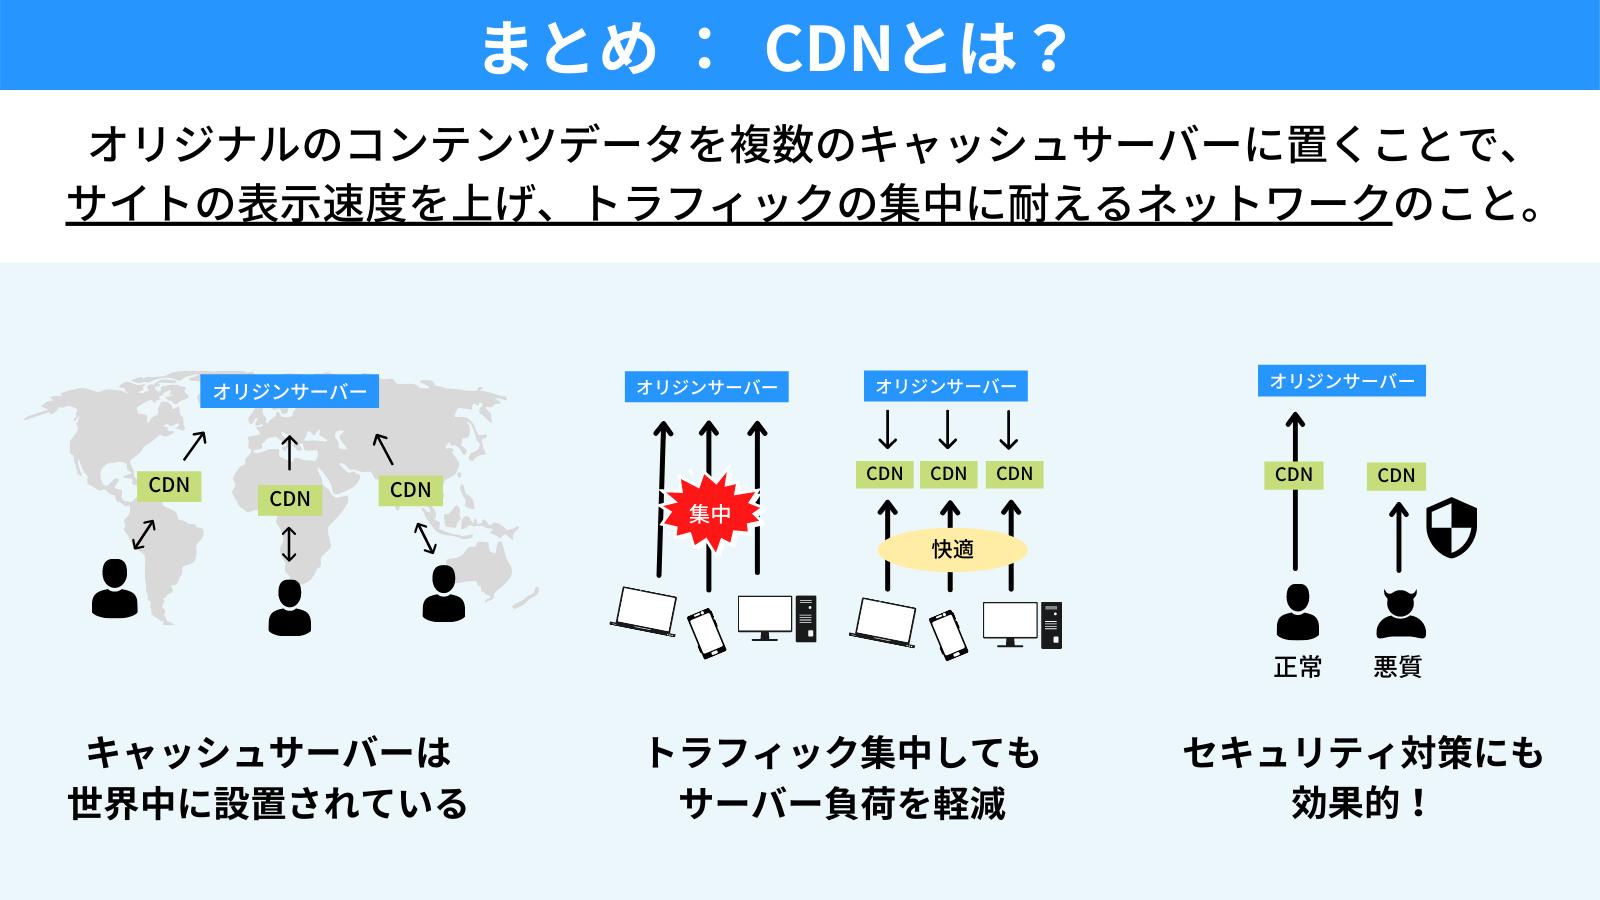 CDNとは